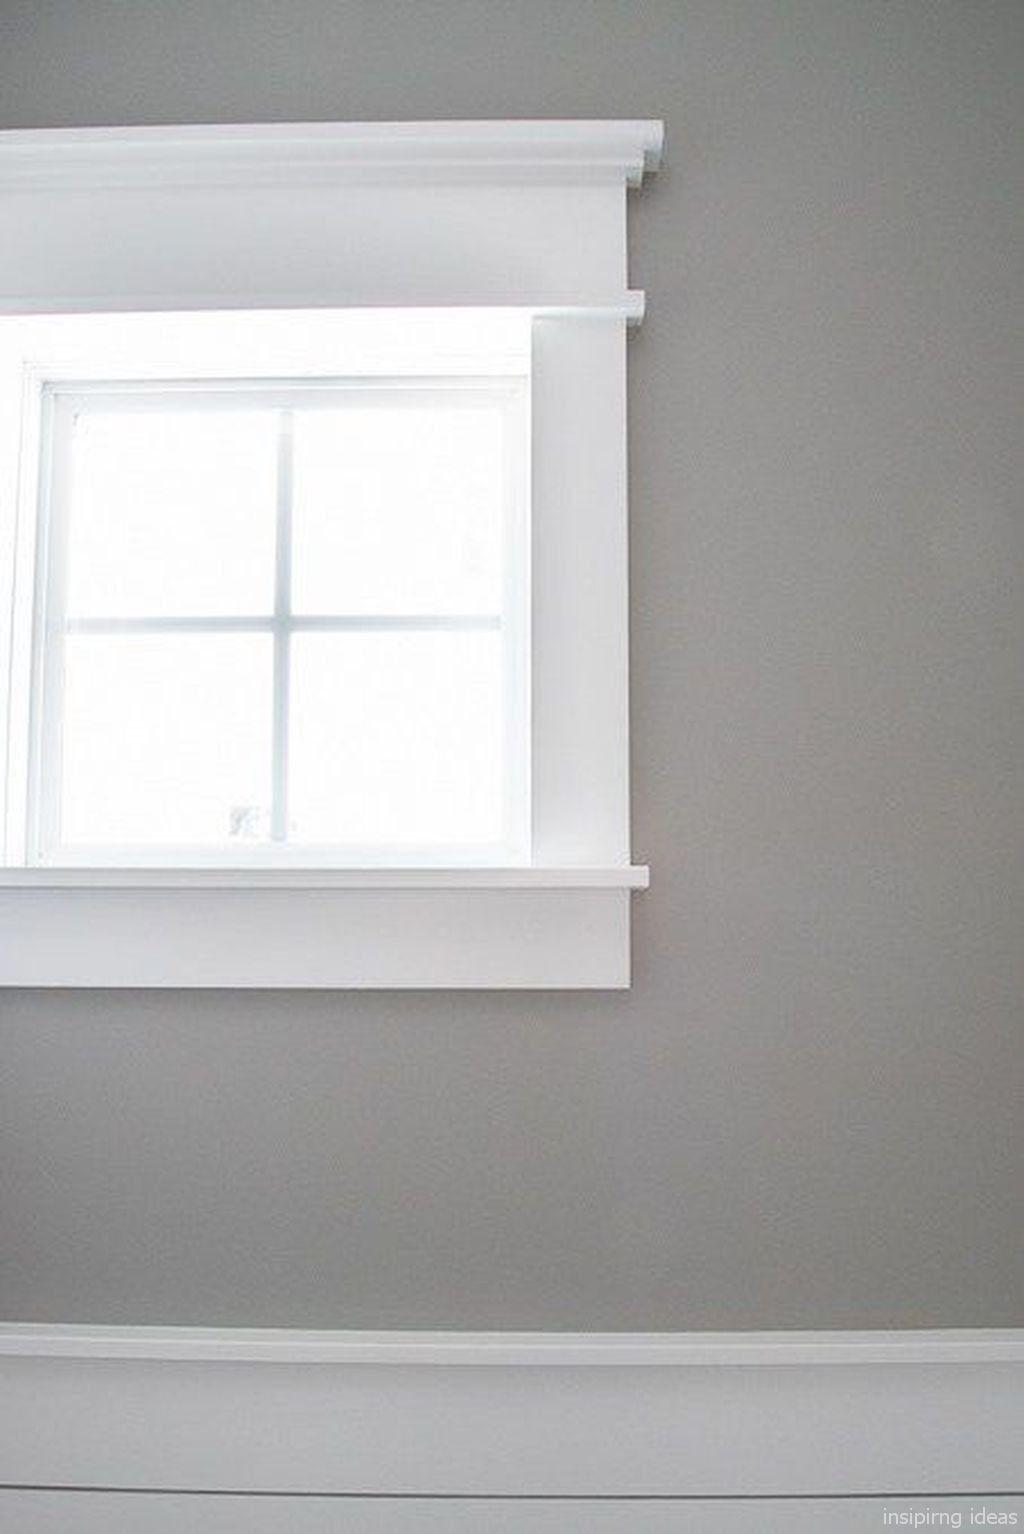 Gorgeous 18 Modern Window Trim Design Ideas https://lovelyving